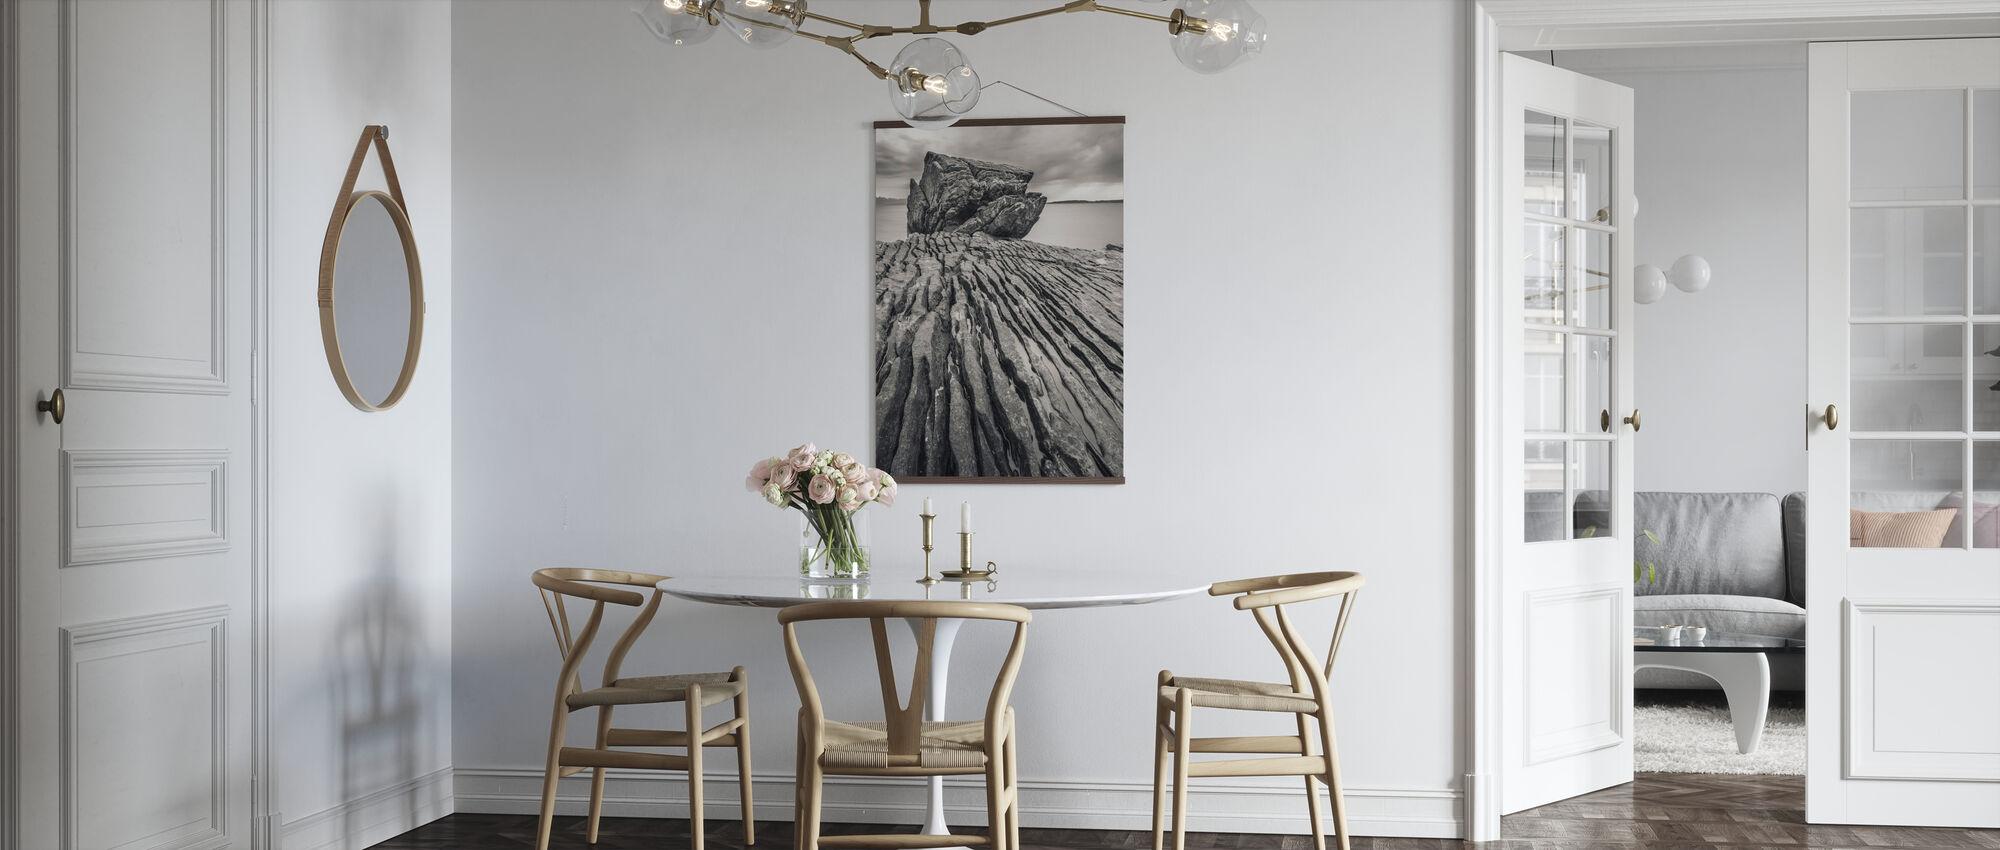 Elgol, Isle of Skye - Scotland - Poster - Kitchen